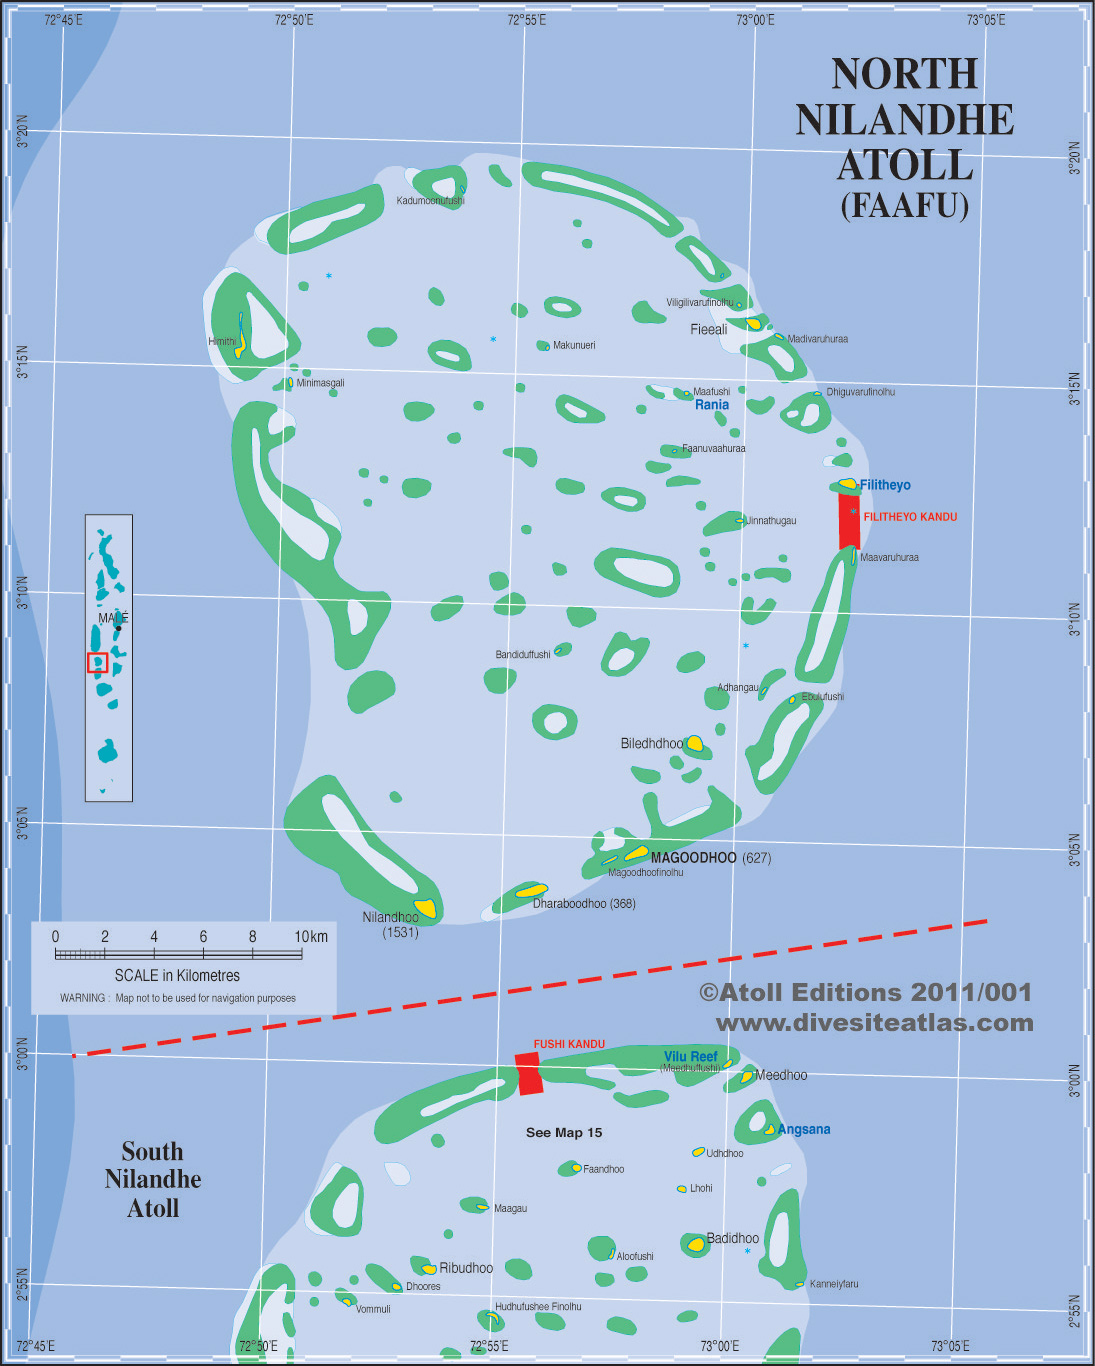 North Nilandhe Atoll Islands (Faafu)